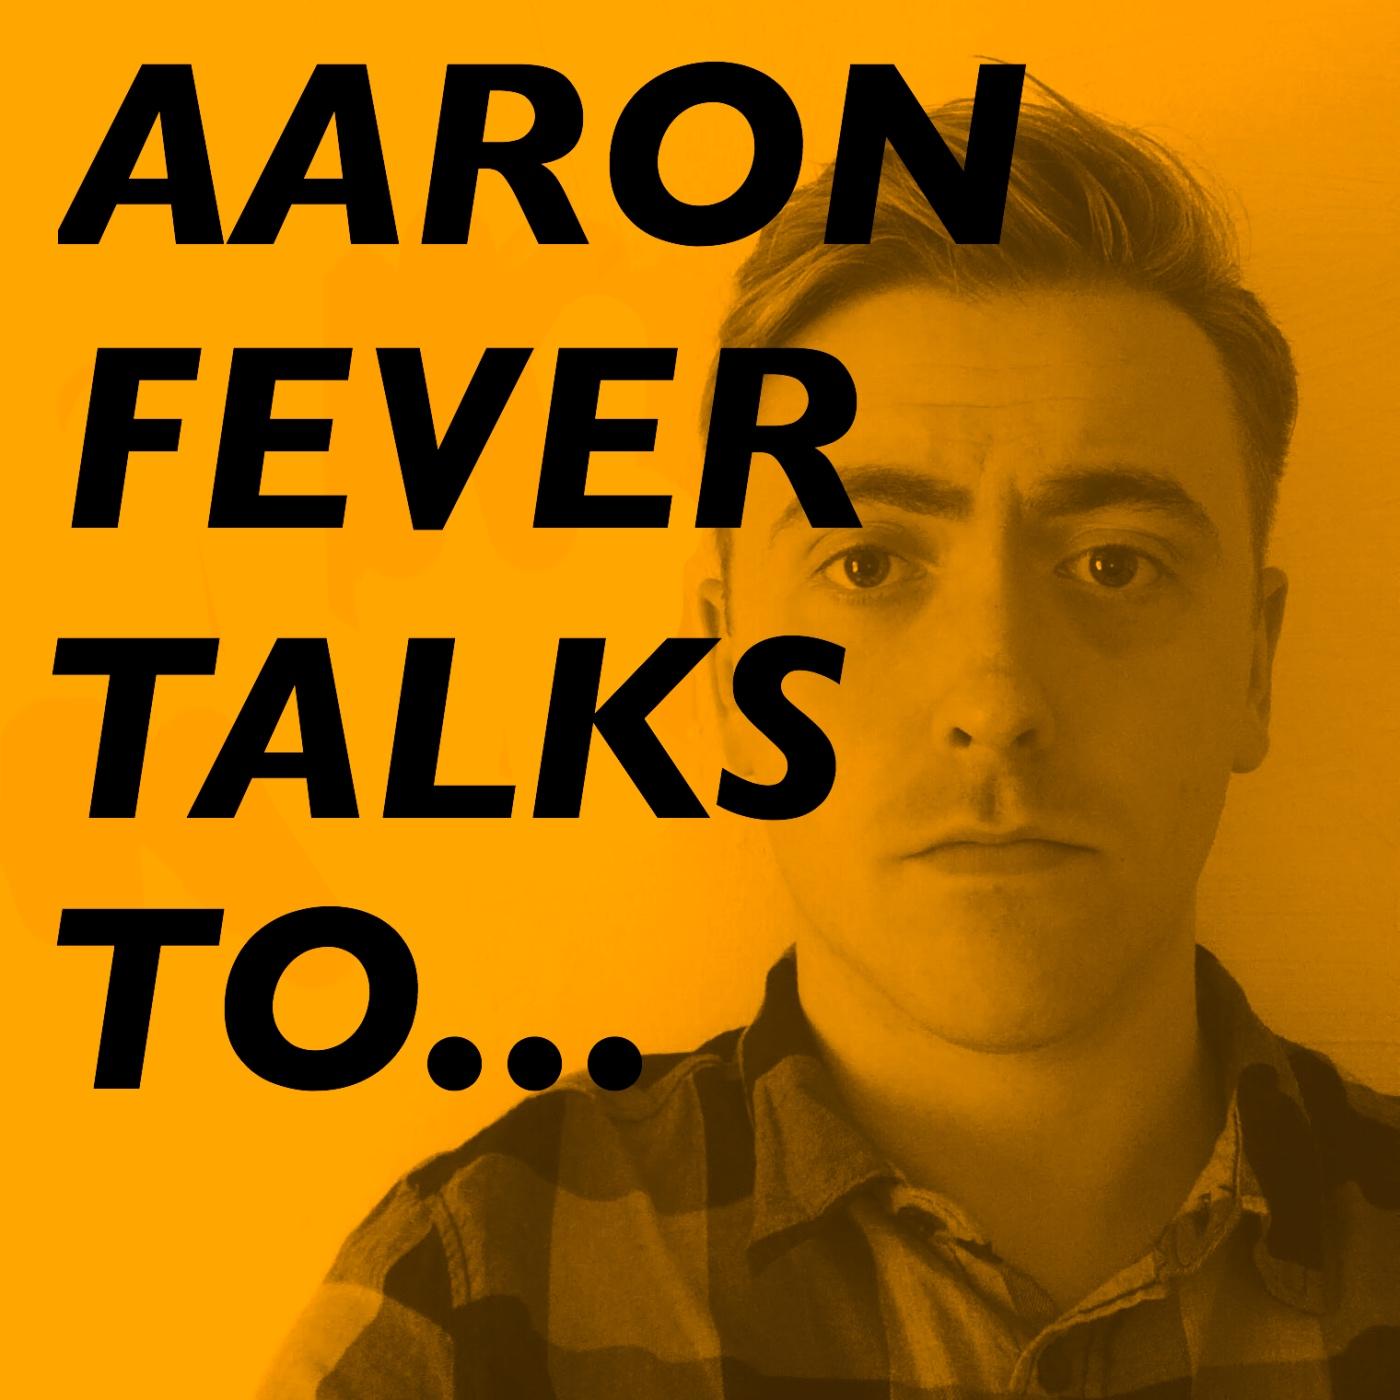 Aaron Fever Talks To...